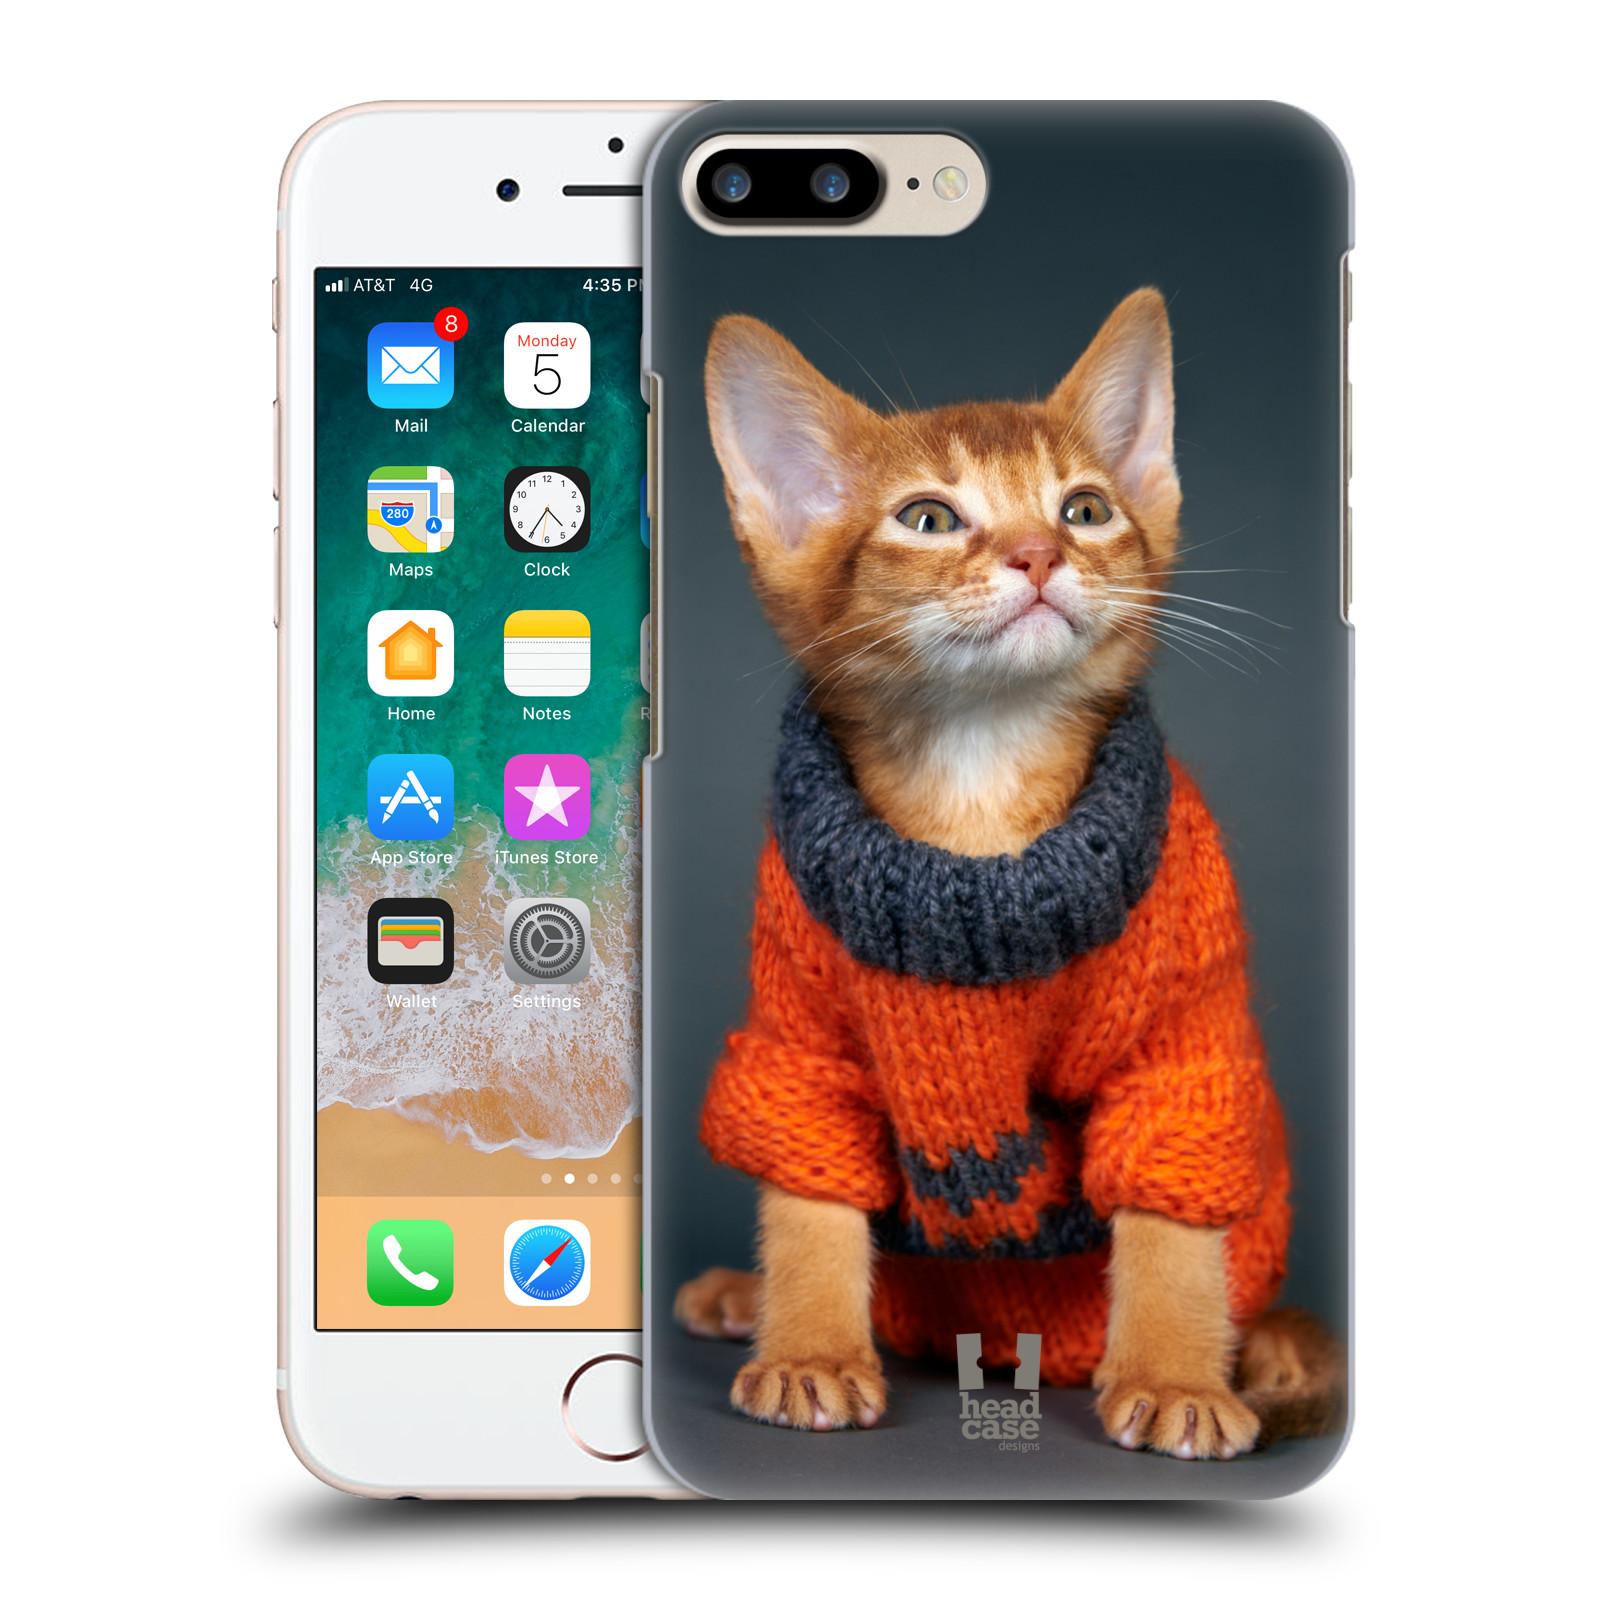 HEAD CASE plastový obal na mobil Apple Iphone 7 PLUS vzor Legrační zvířátka kočička v oranžovém svetru